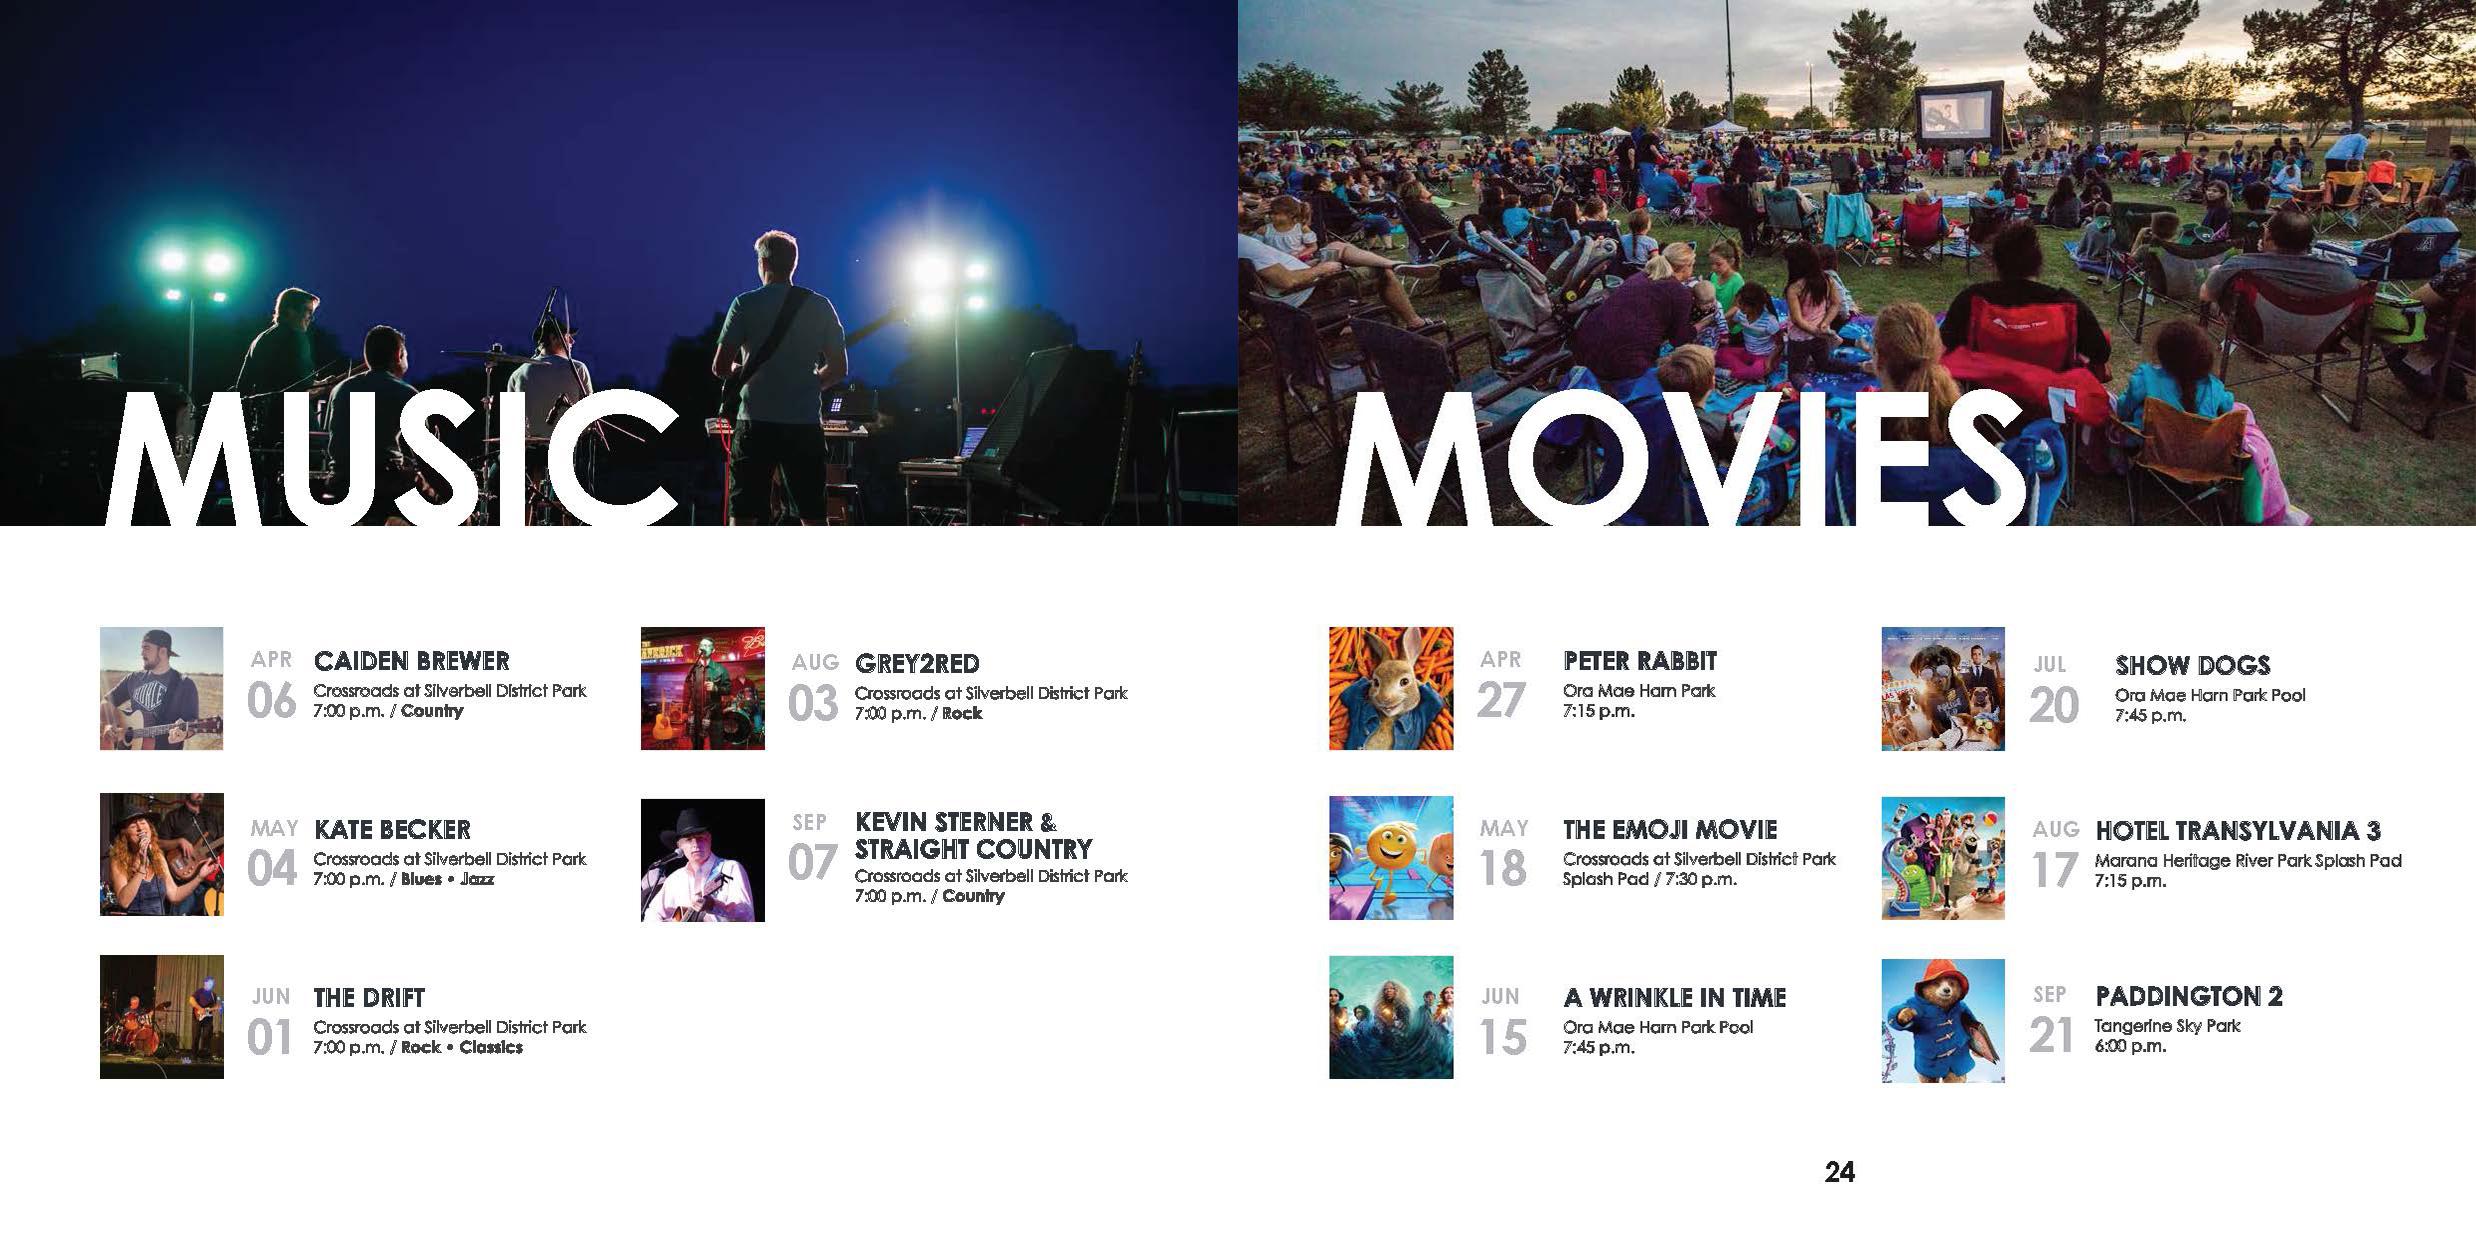 musicmovies.jpg